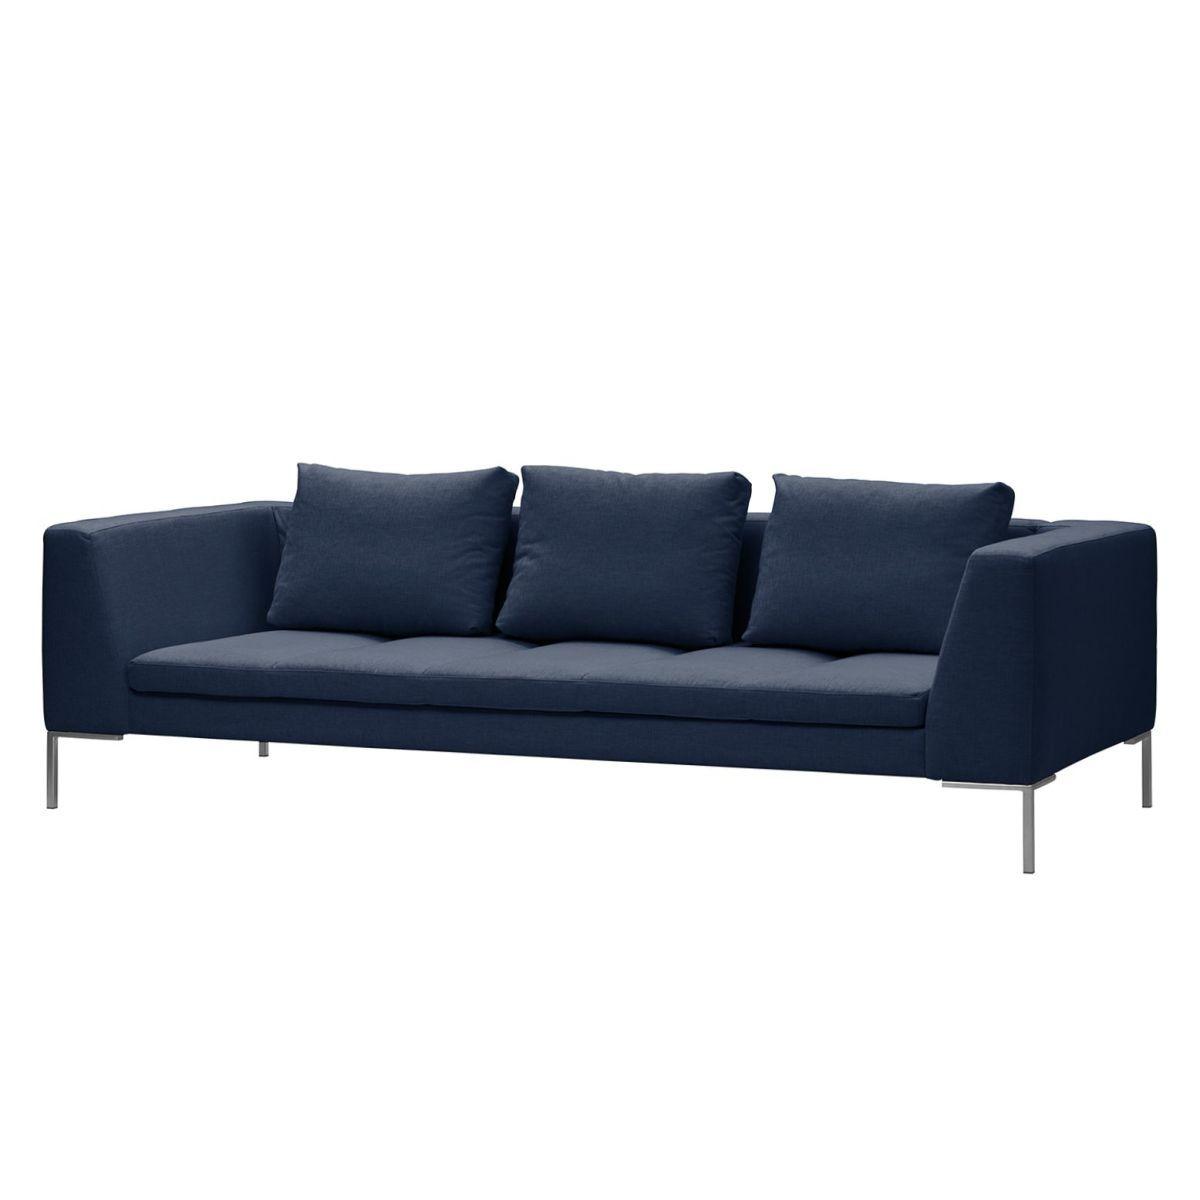 Sofa Madison (3-Sitzer) Webstoff - Stoff Milan Dunkelblau, Studio ...